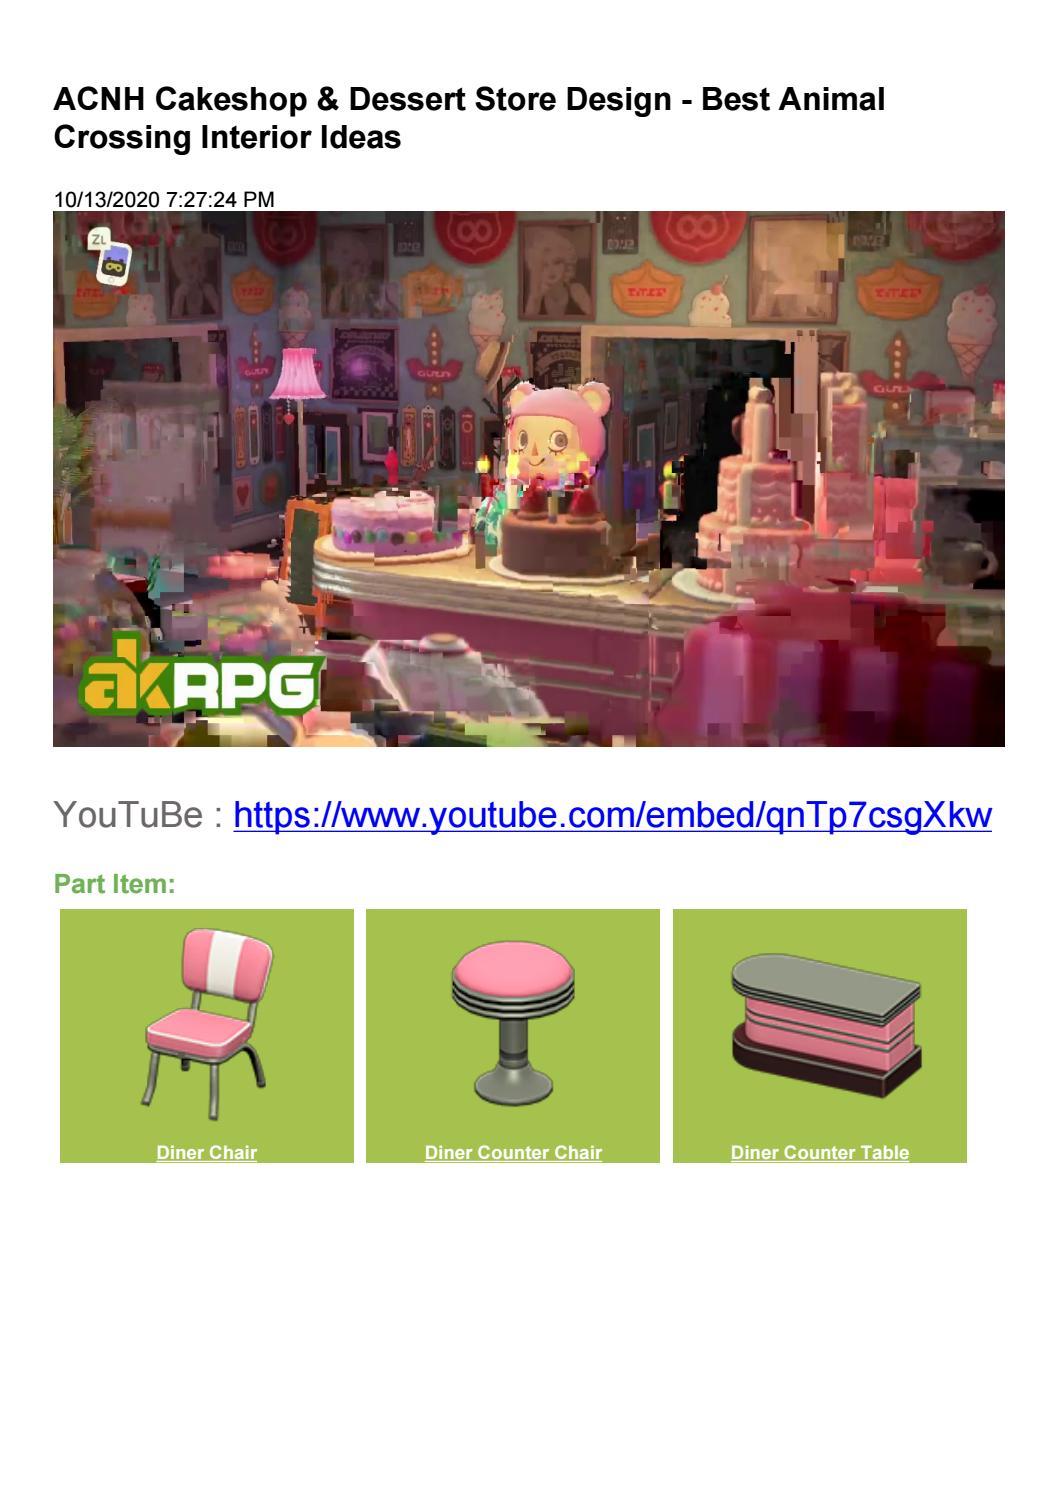 Acnh Cakeshop Dessert Store Design Best Animal Crossing Interior Ideas By Akrpg Issuu